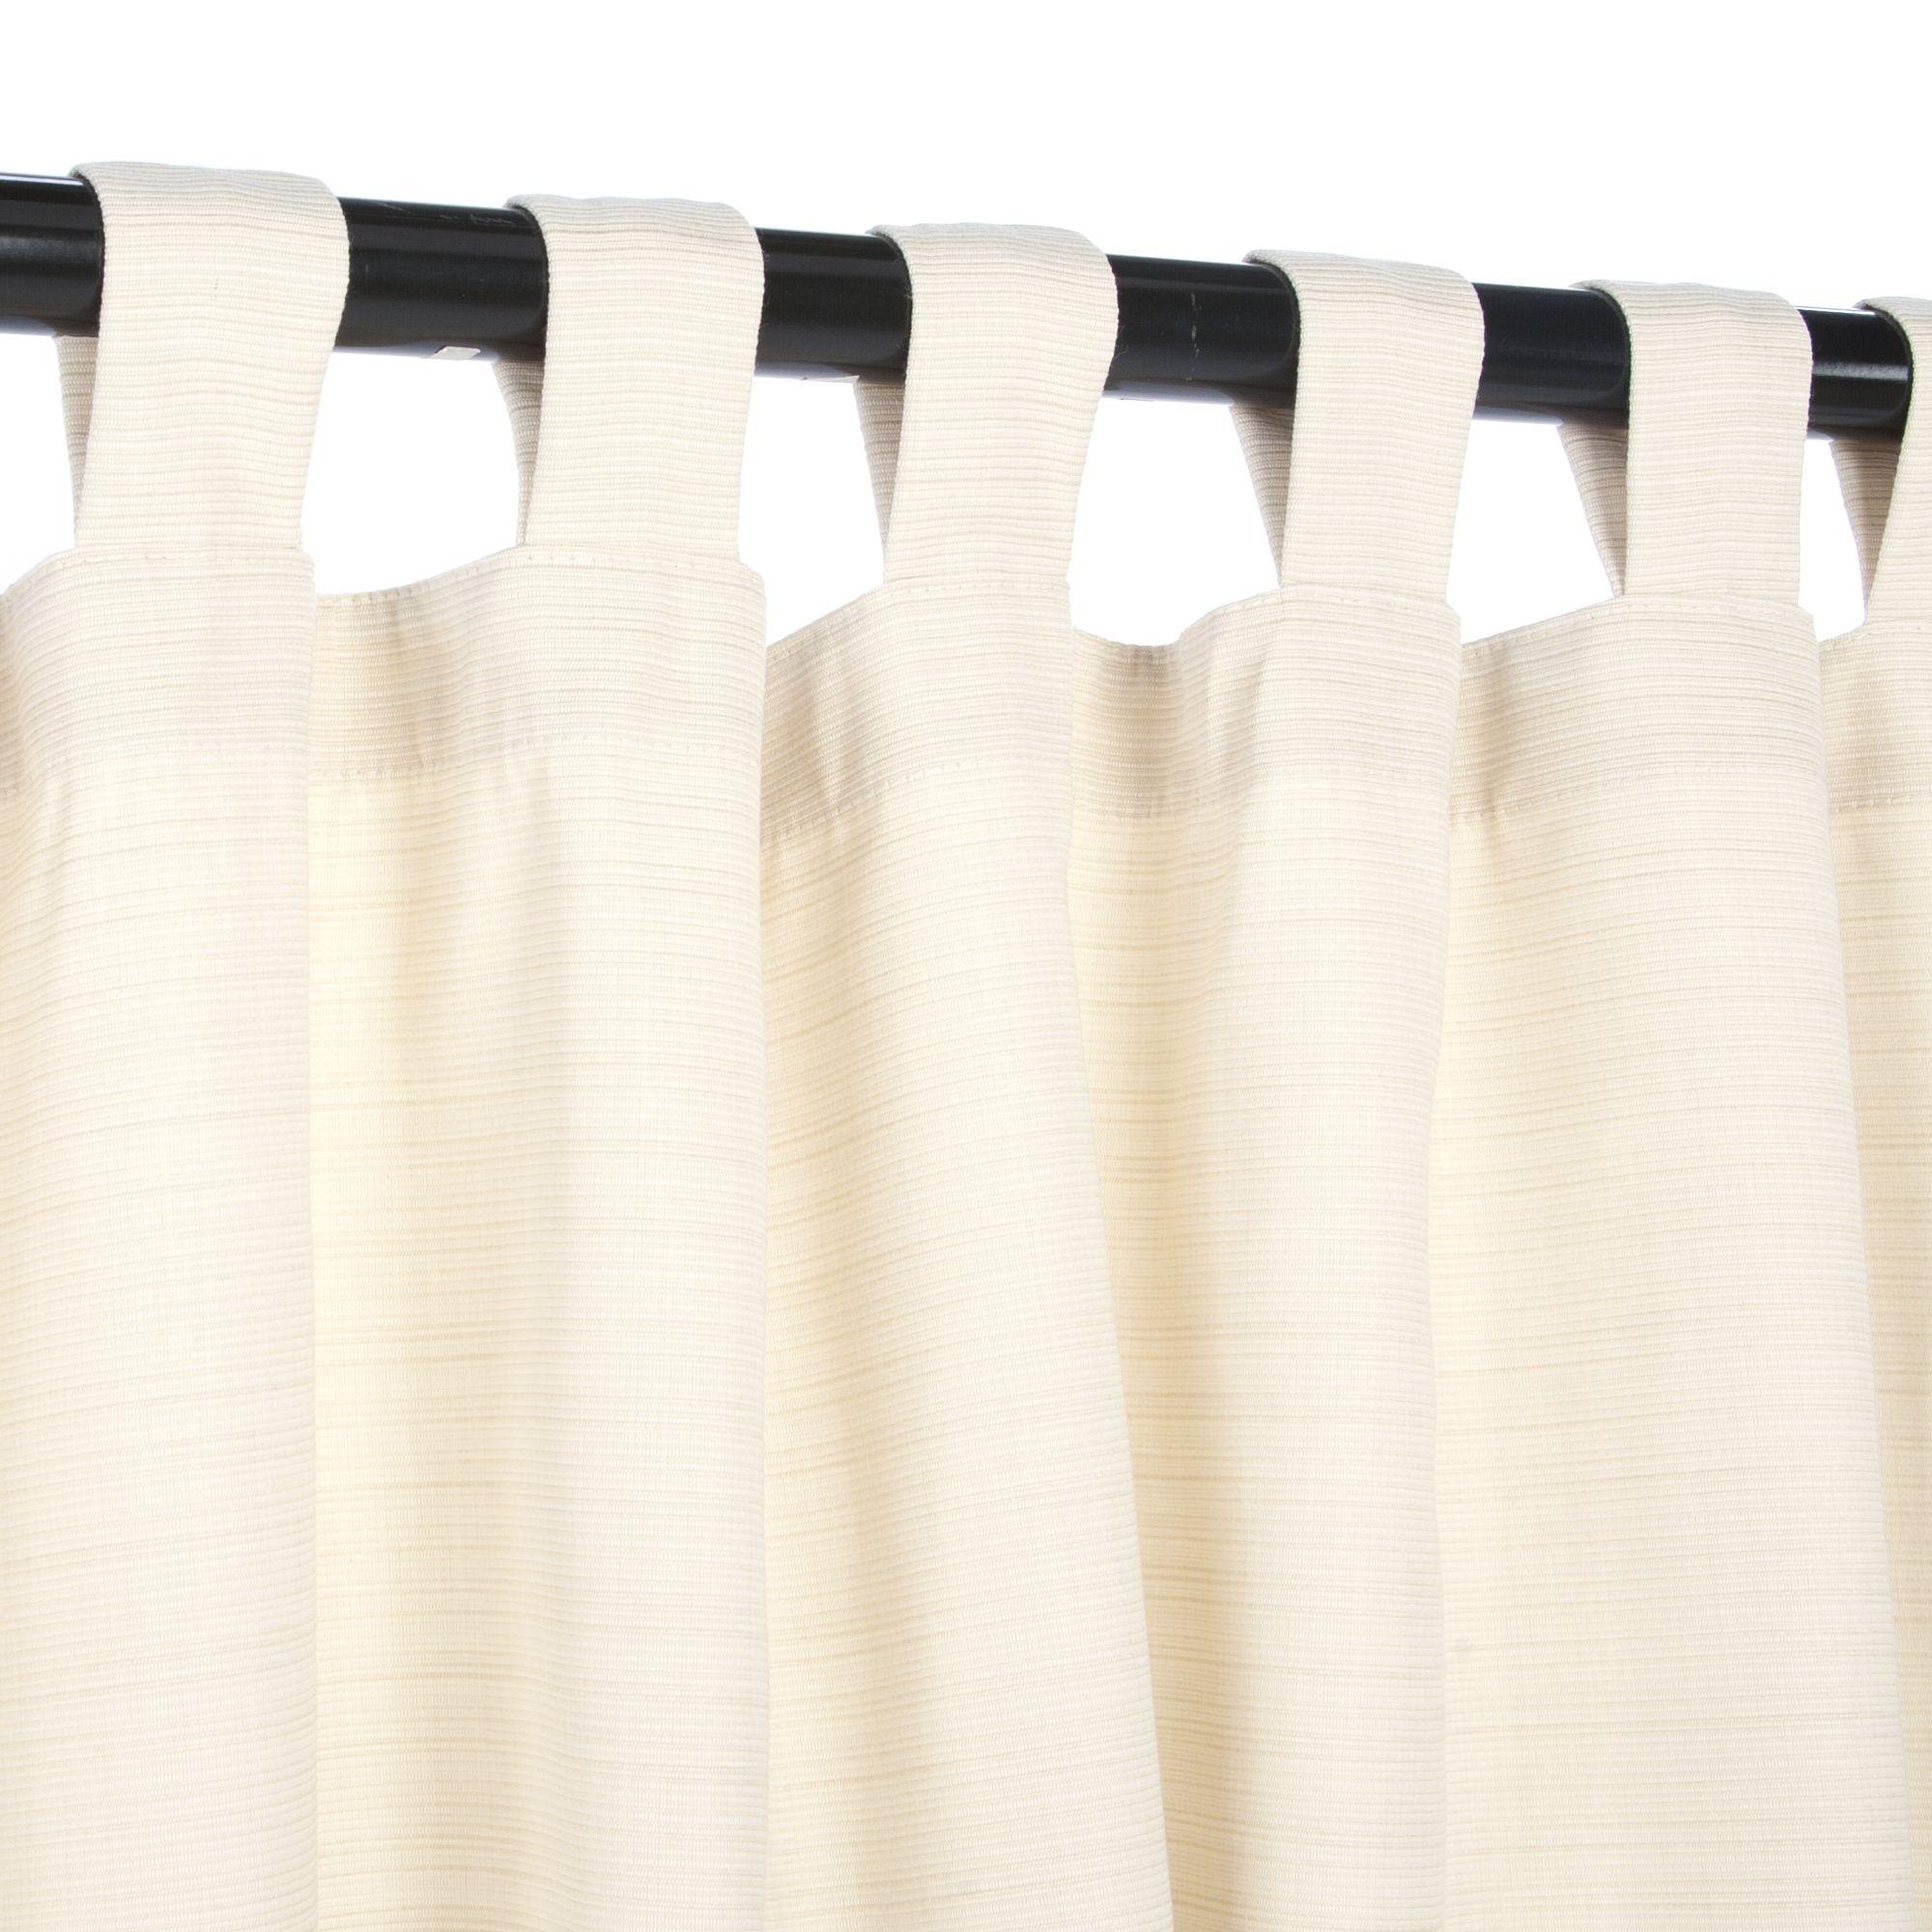 Rosa Beltran Design Customizing Inexpensive Linen Curtains Diy Tutorial